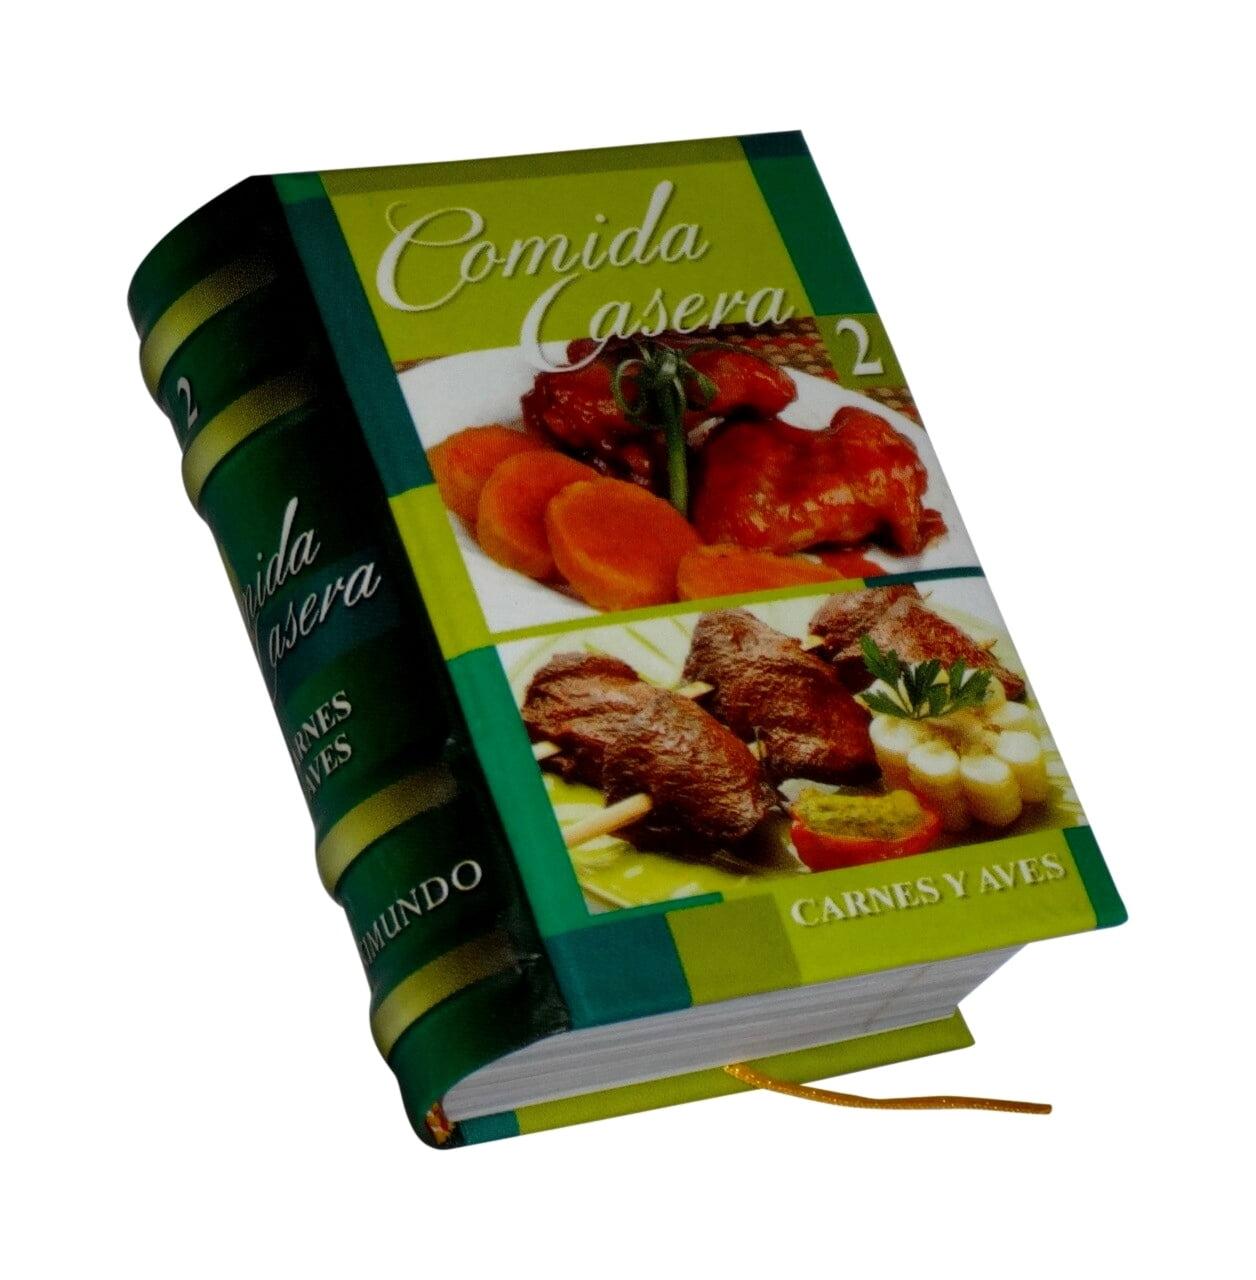 comida_casera-2-miniature-book-libro